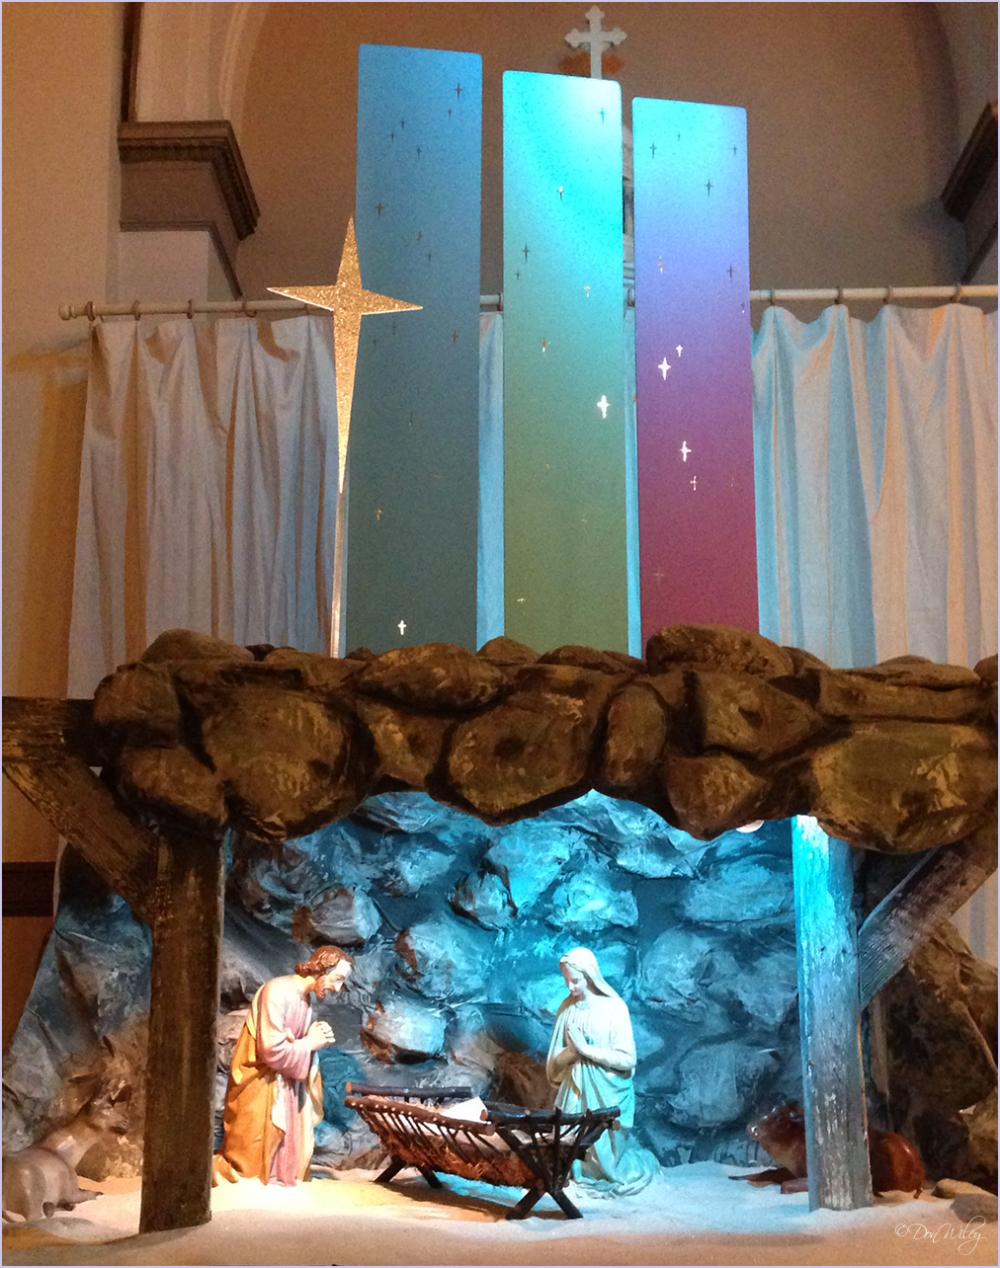 St. Aloysius Nativity Scene